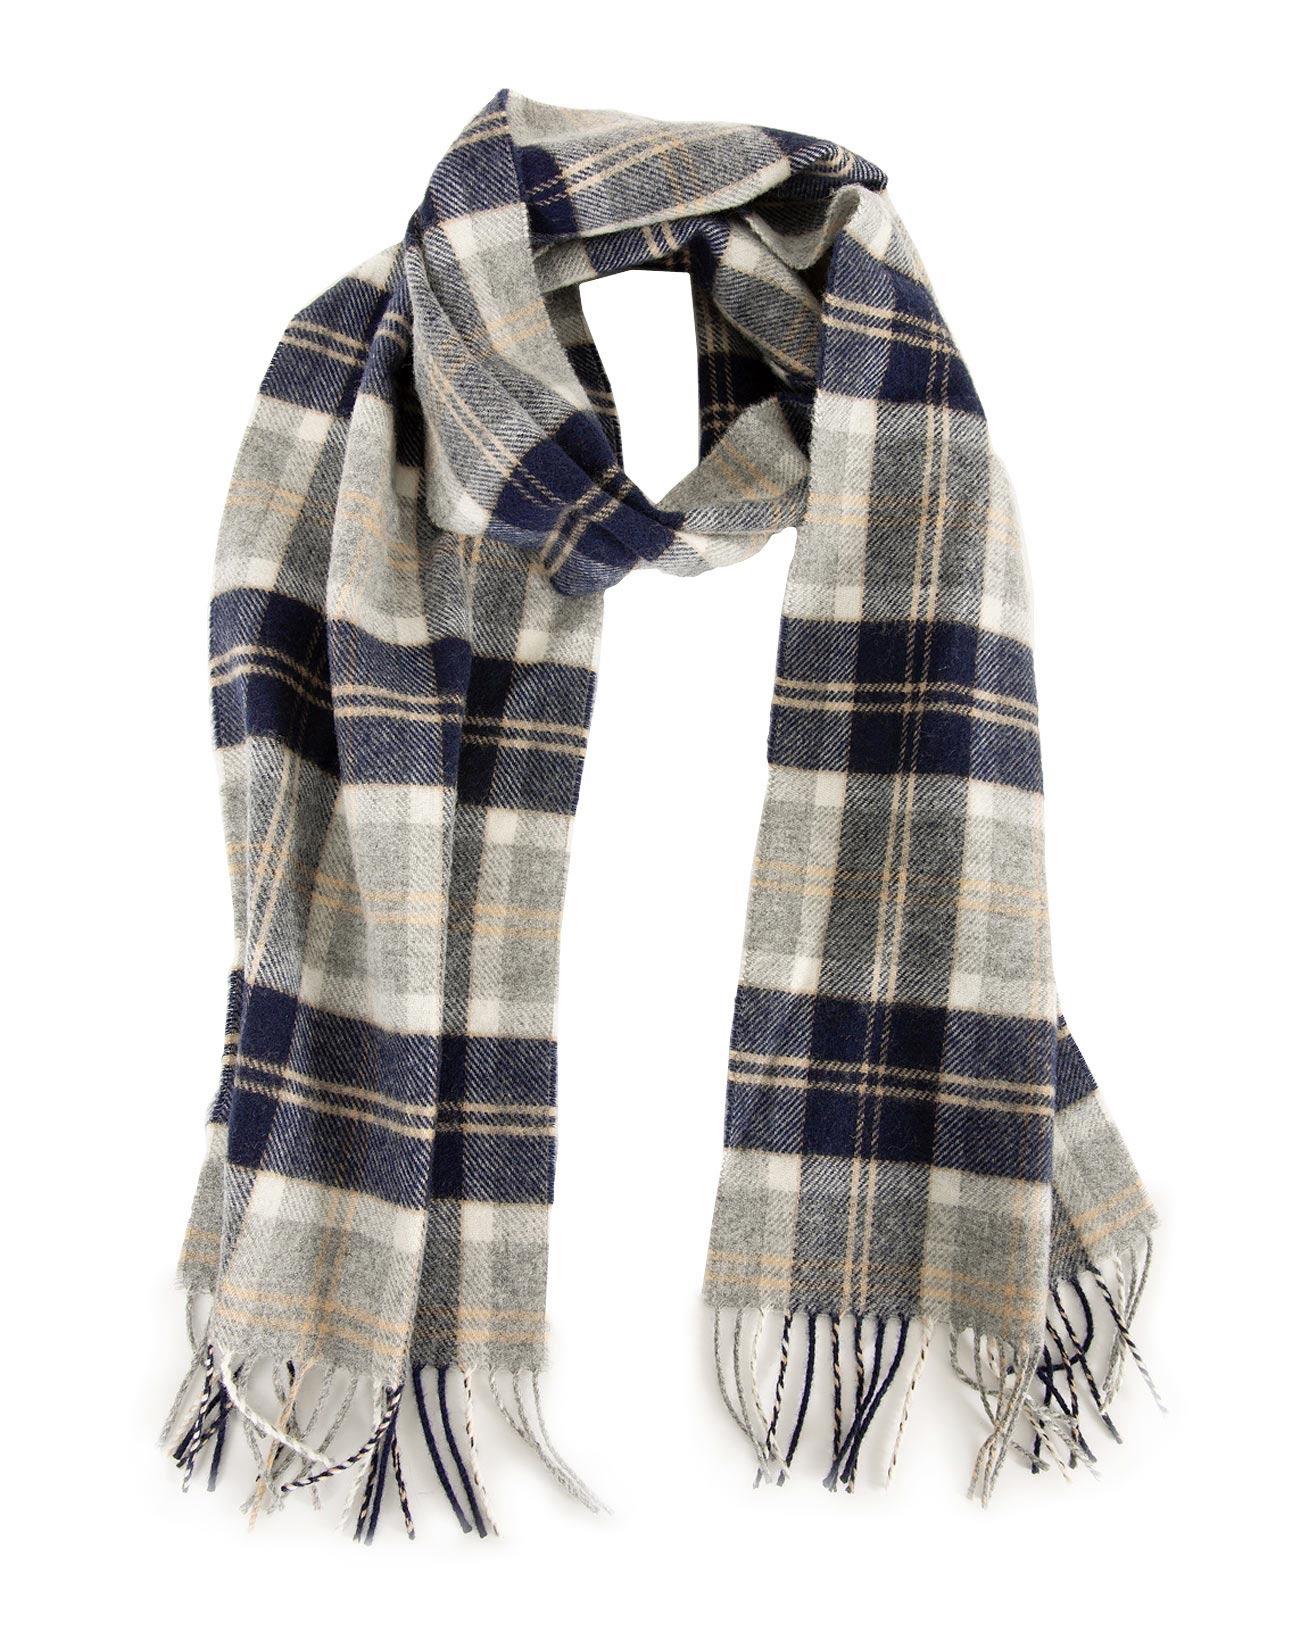 5864--lambswool-tartan-scarf--silver-bannockbane---colourupdate.jpg